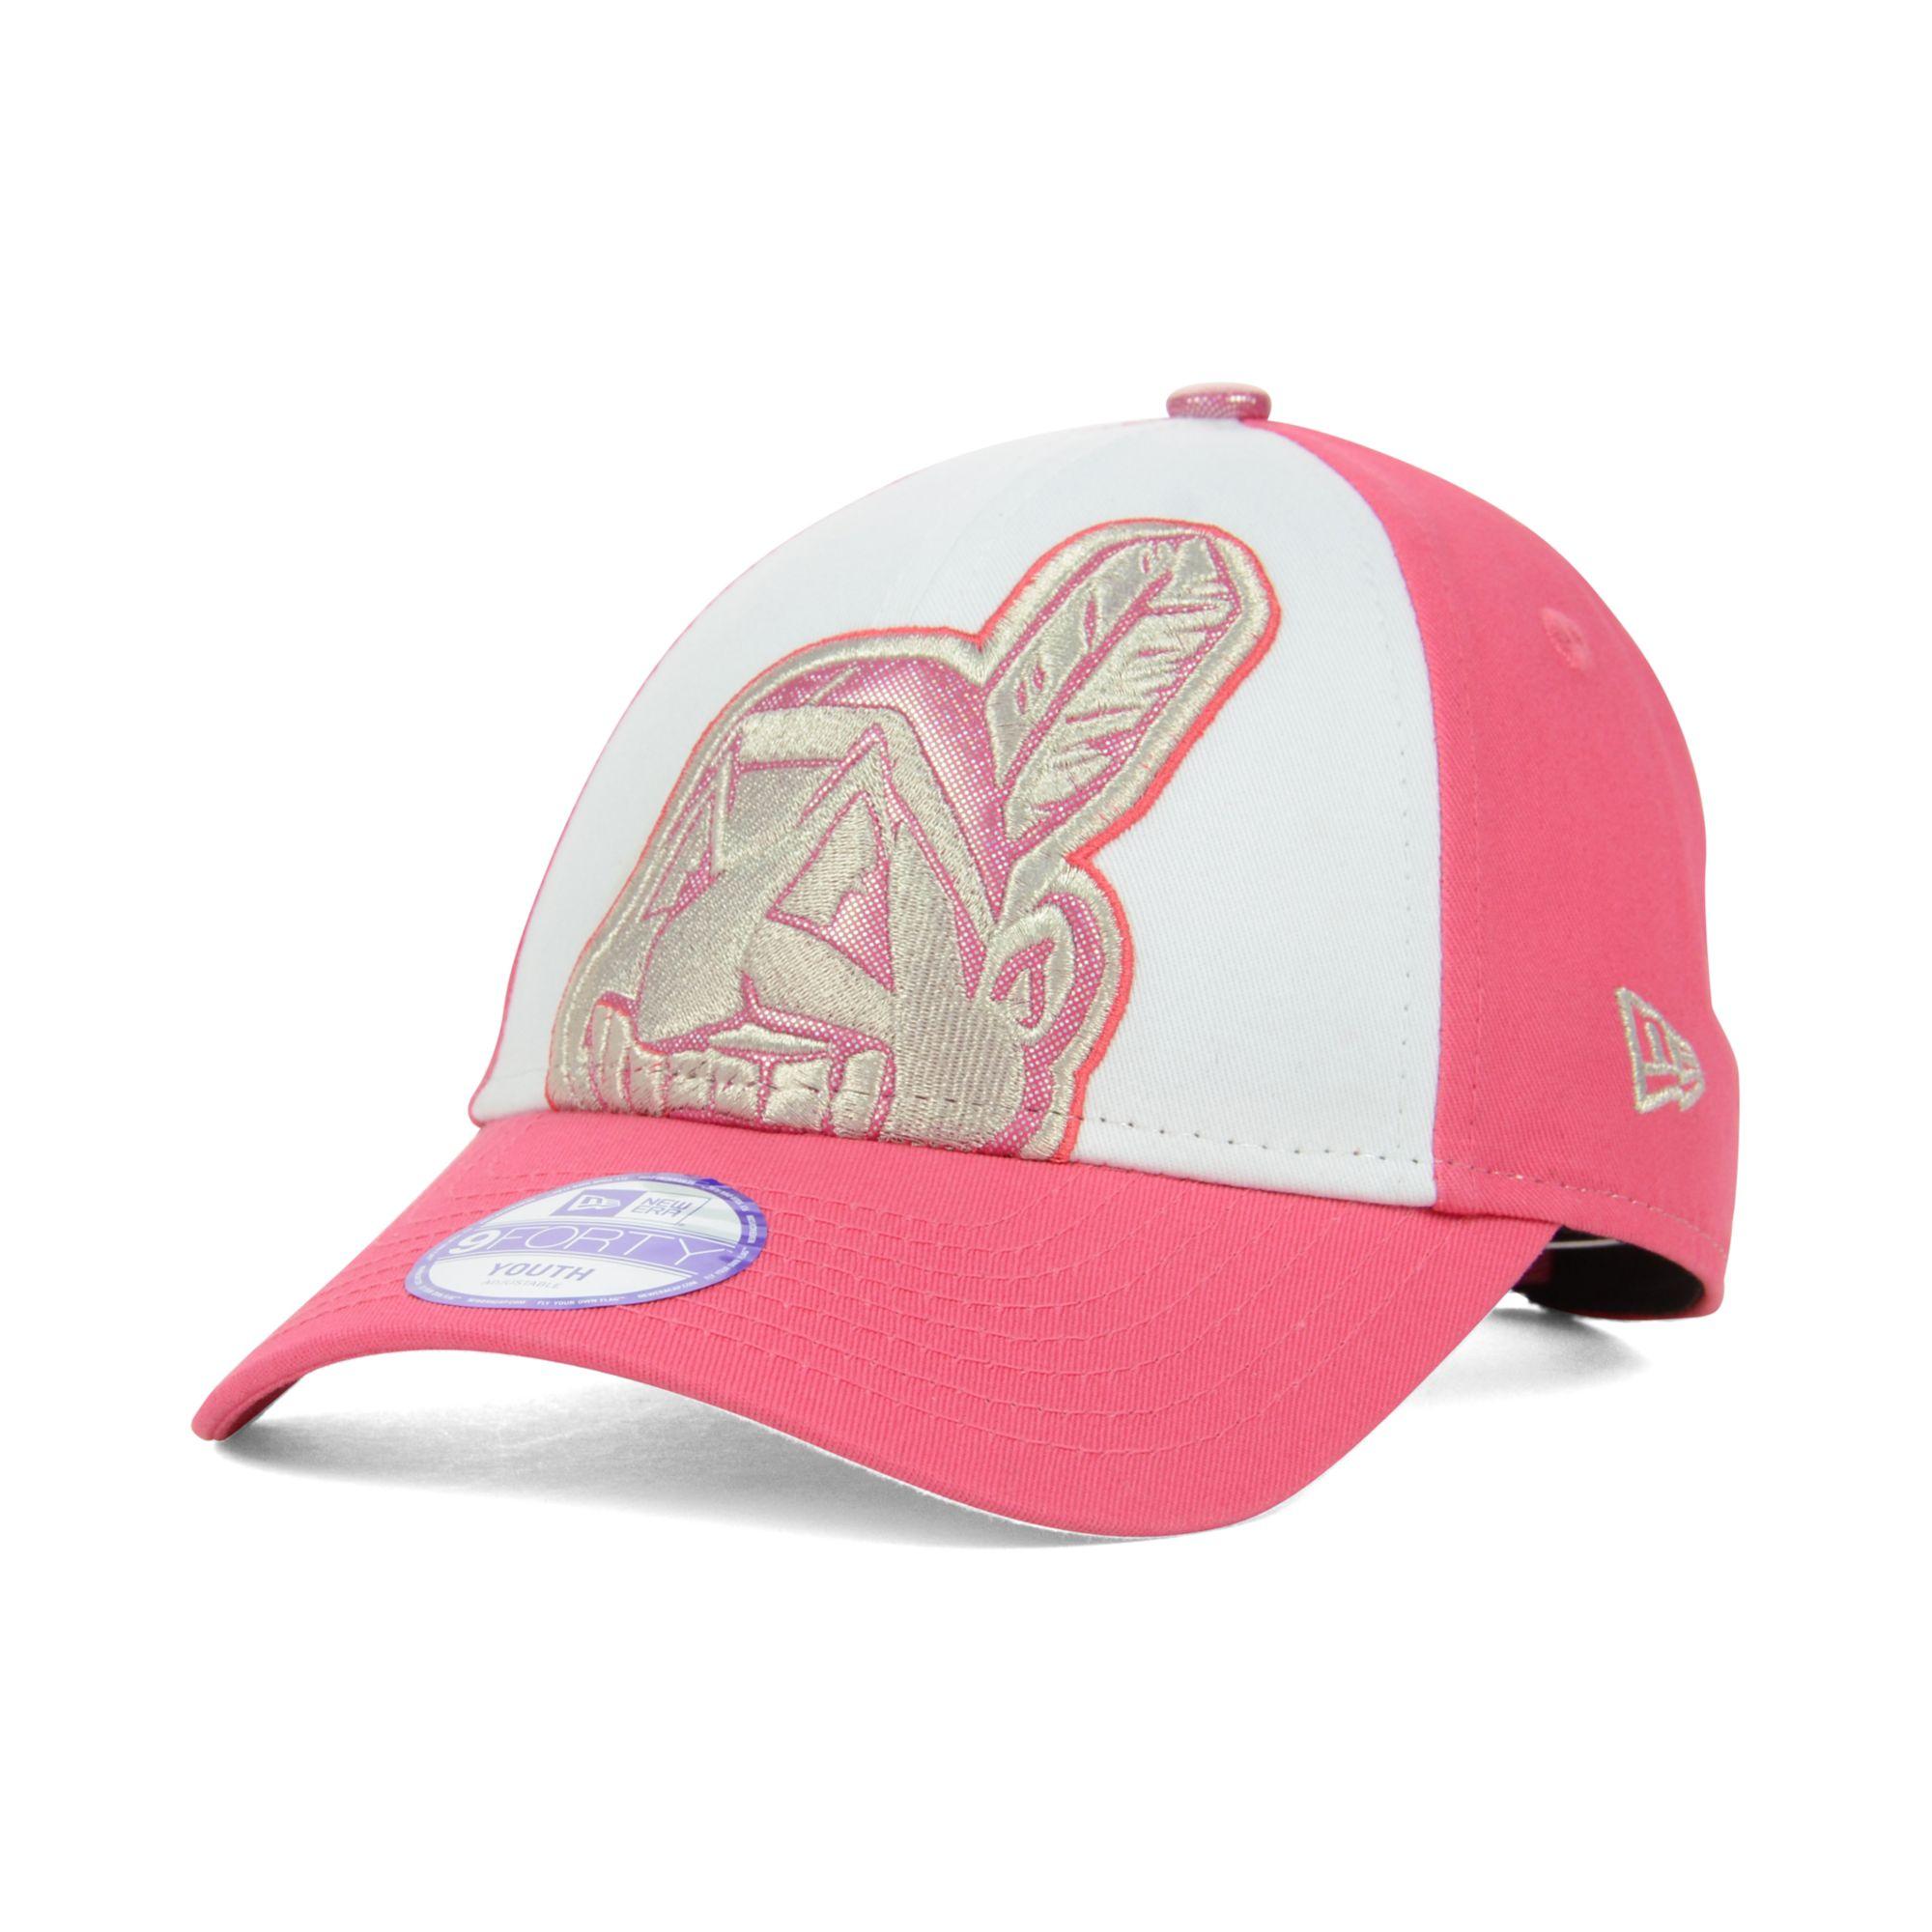 info for 83244 2db97 Women's Pink Kids Cleveland Indians Glitter Filler 9forty Cap